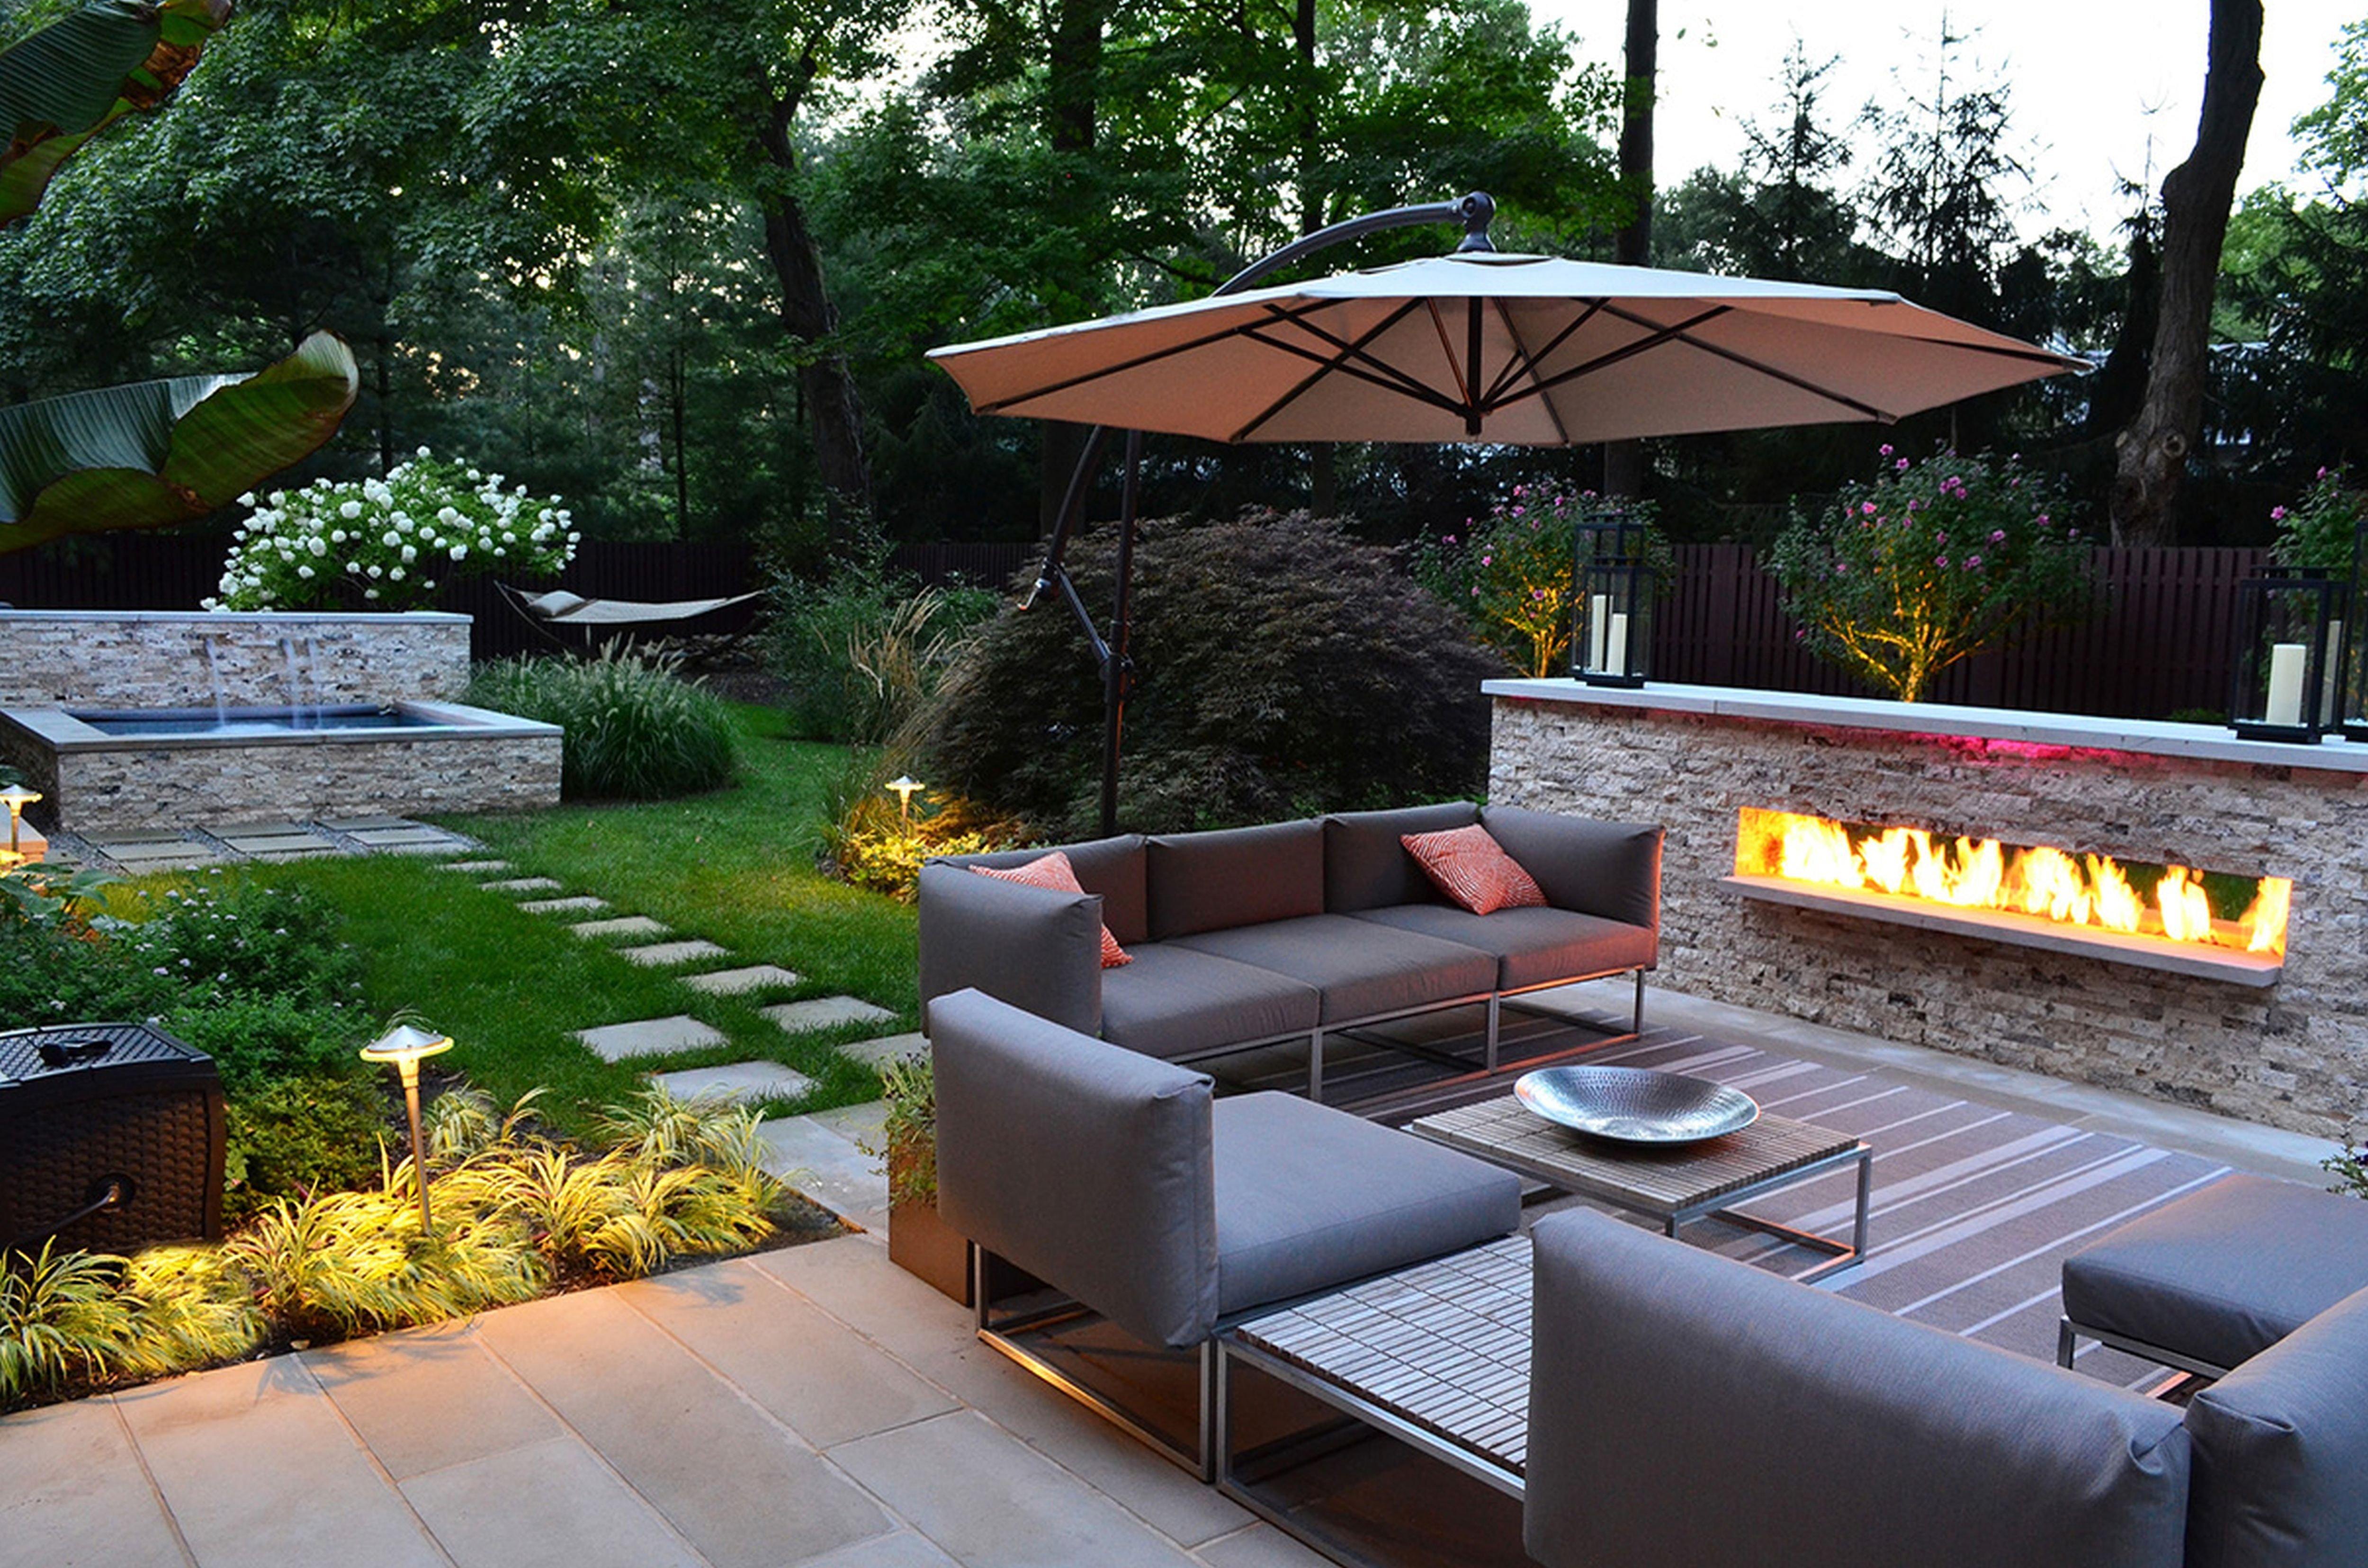 10 Nice Mid Century Modern Landscape Design Ideas mid century modern residential landscape house design ideas with 2021